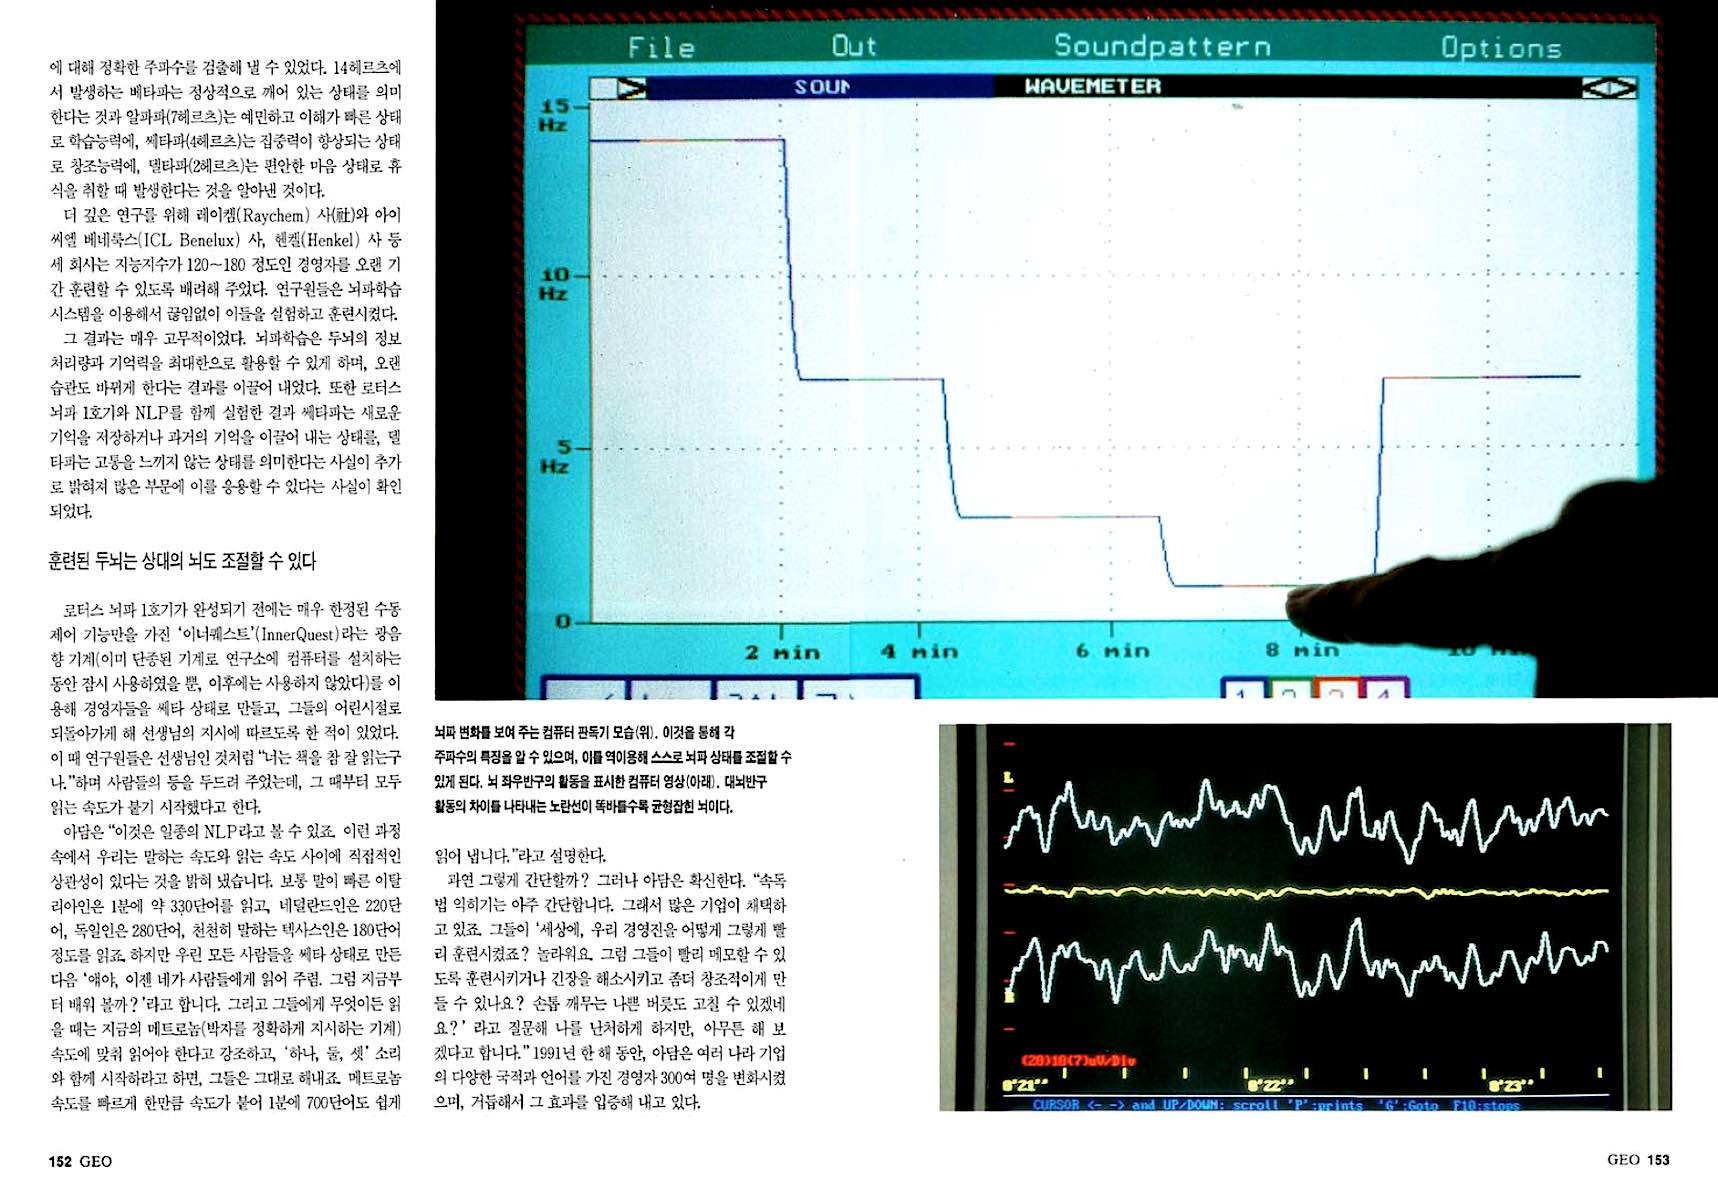 Technology magazine dubbel spreads by Floris Leeuwenberg